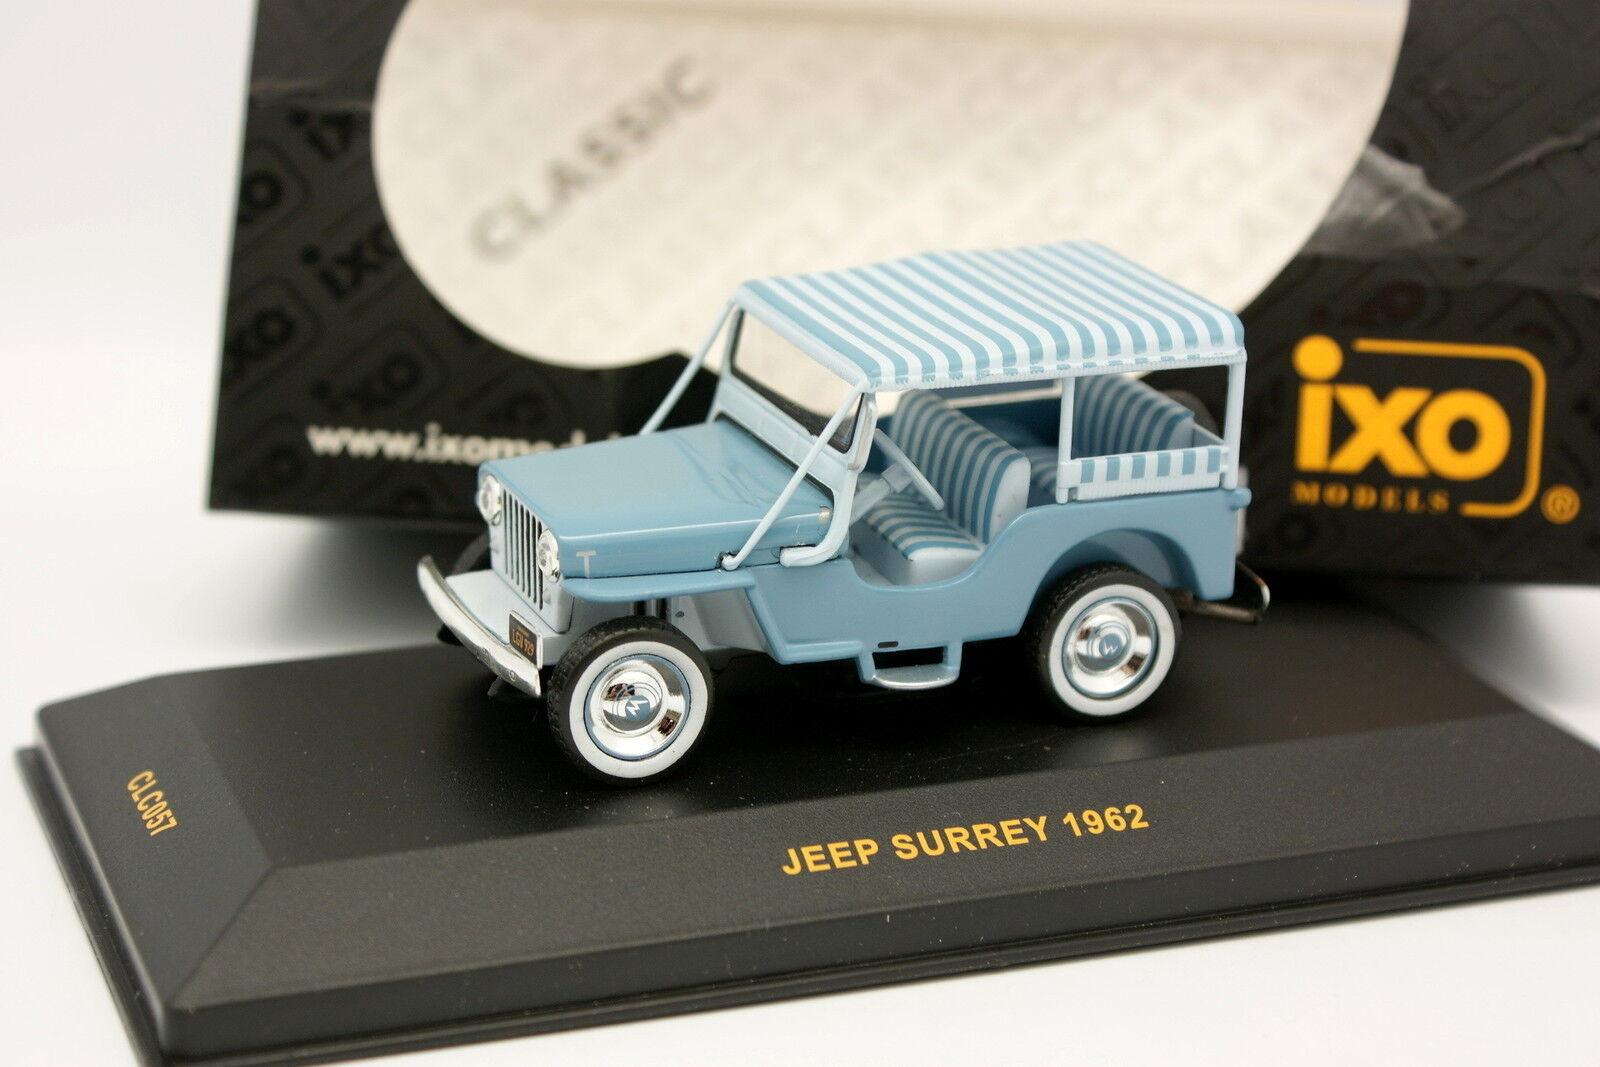 Ixo 1 43 - Jeep Surrey 1962